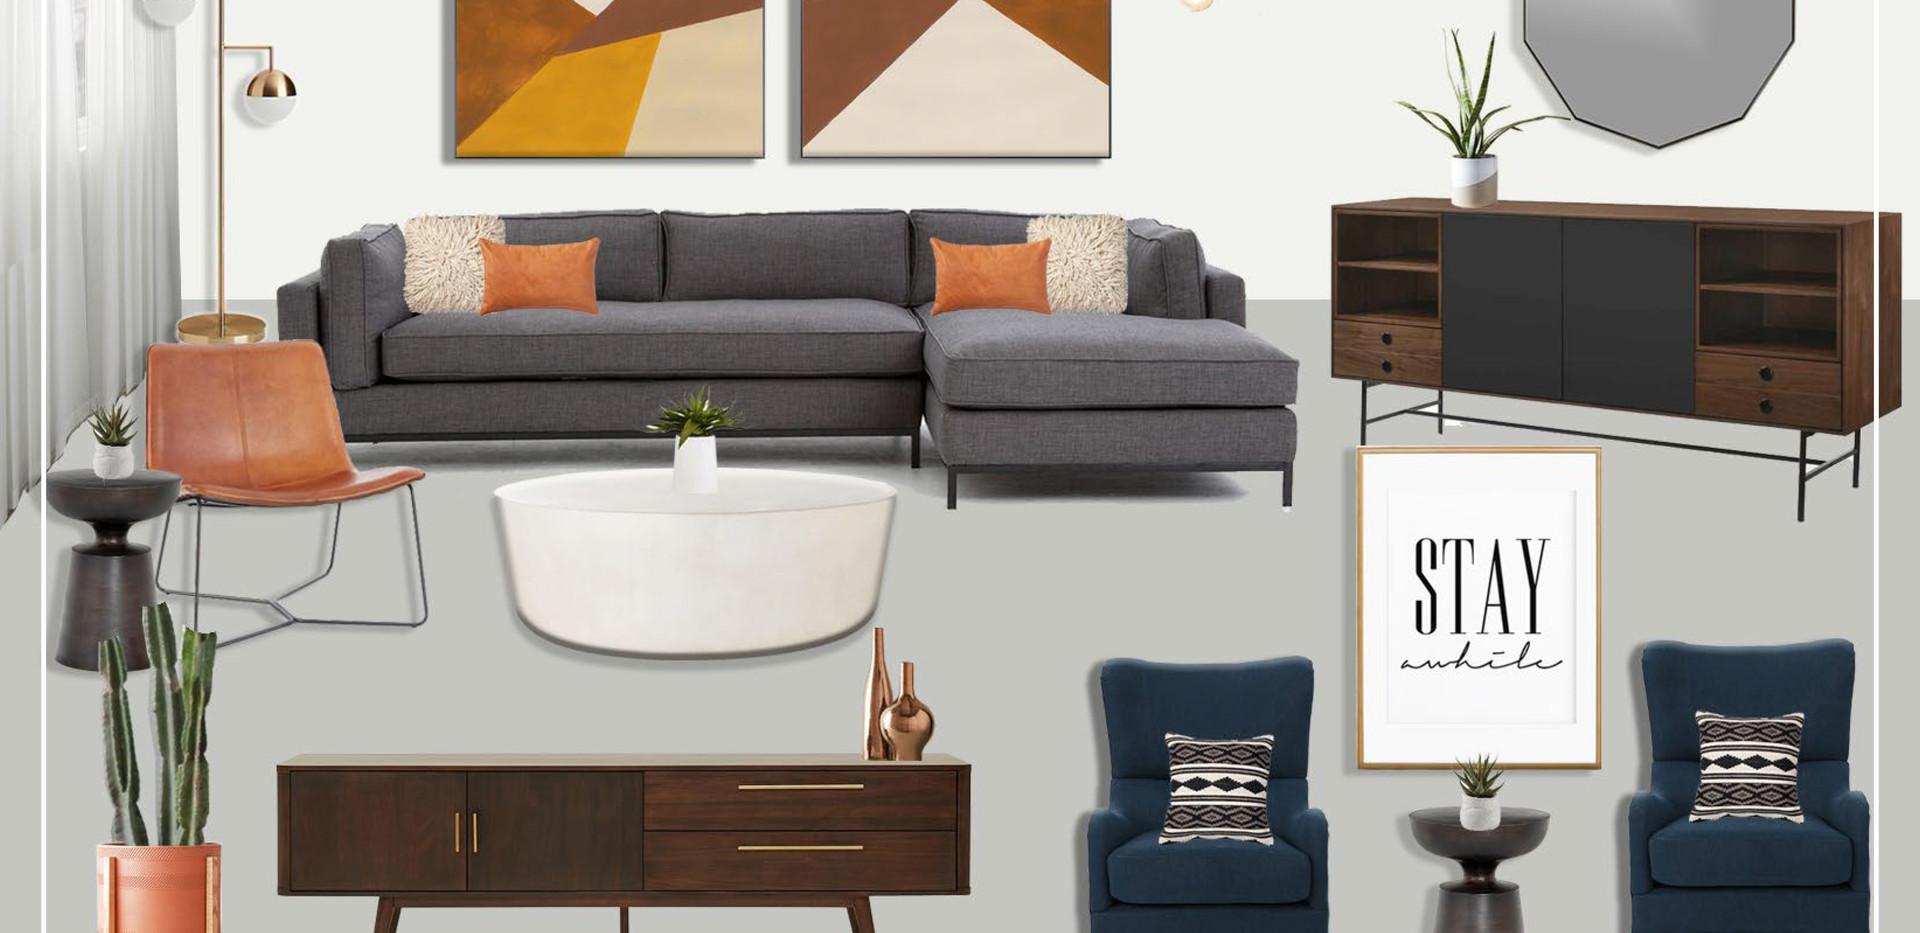 Living Room | Original Concept Collage